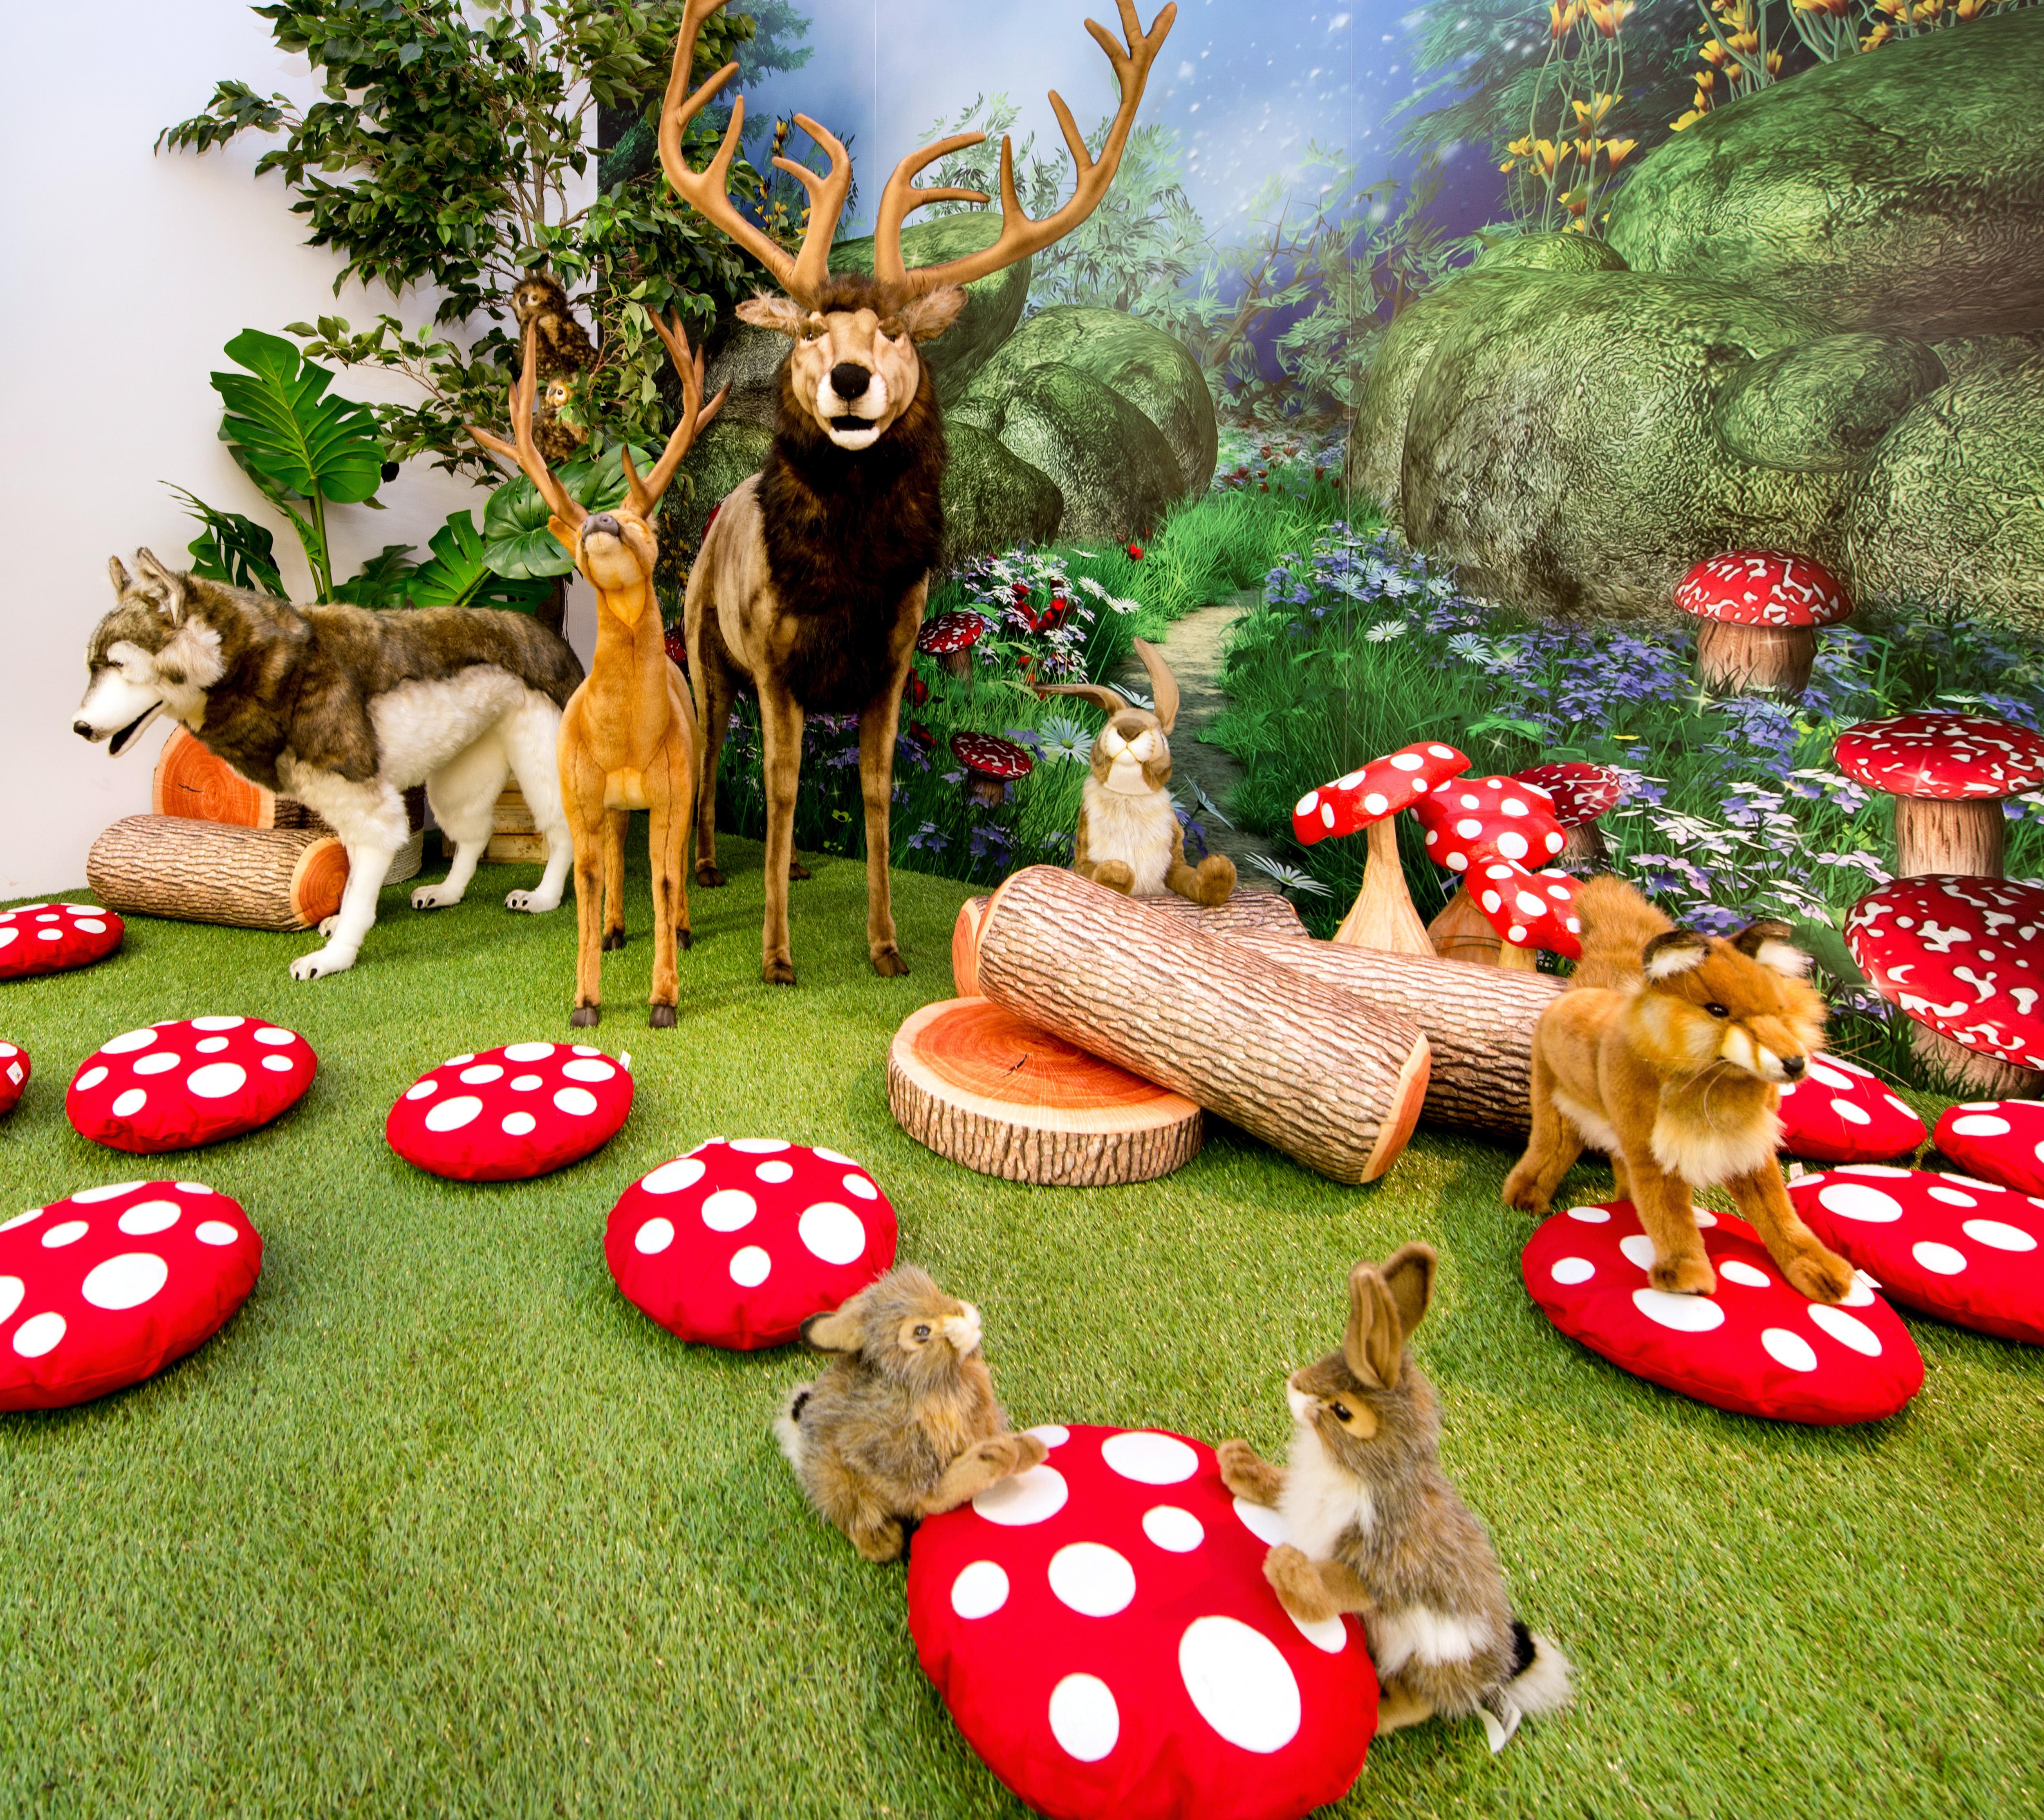 2016-tph-robina-woodland-play-park-015